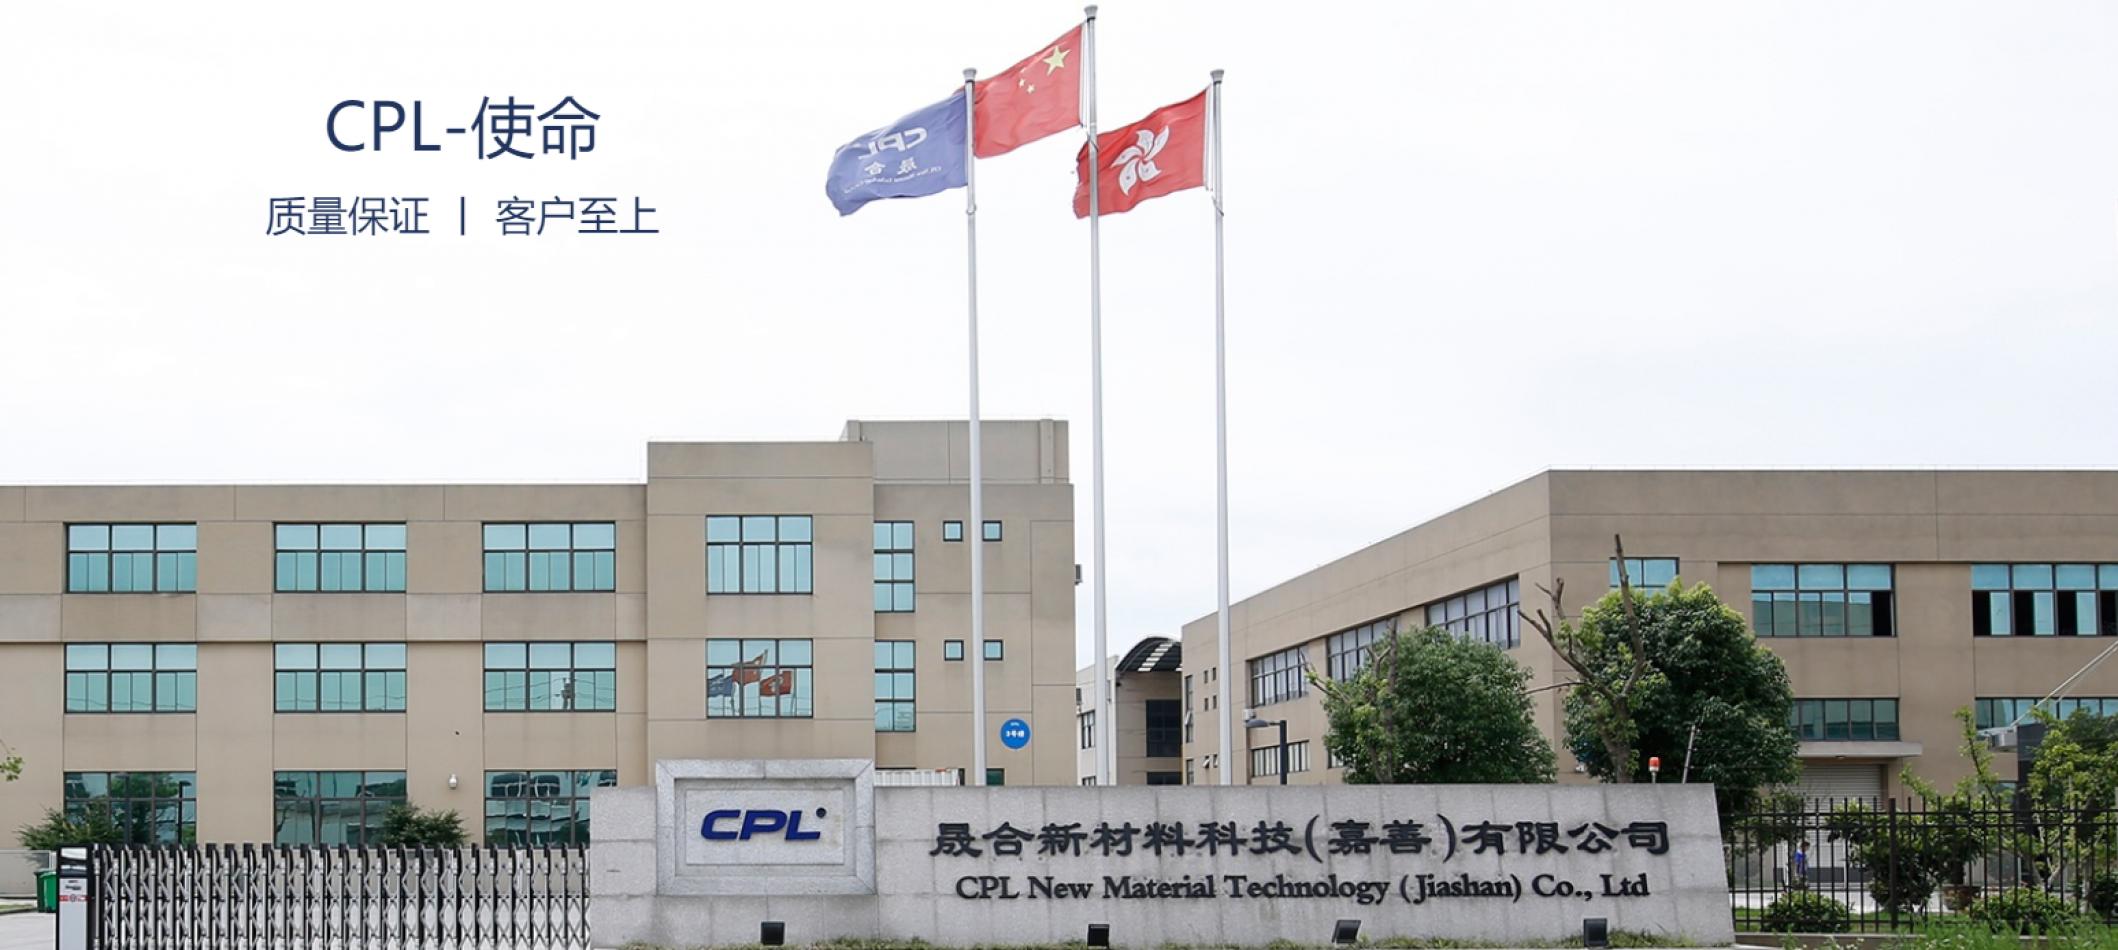 CPL INTERLINING CO., LTD